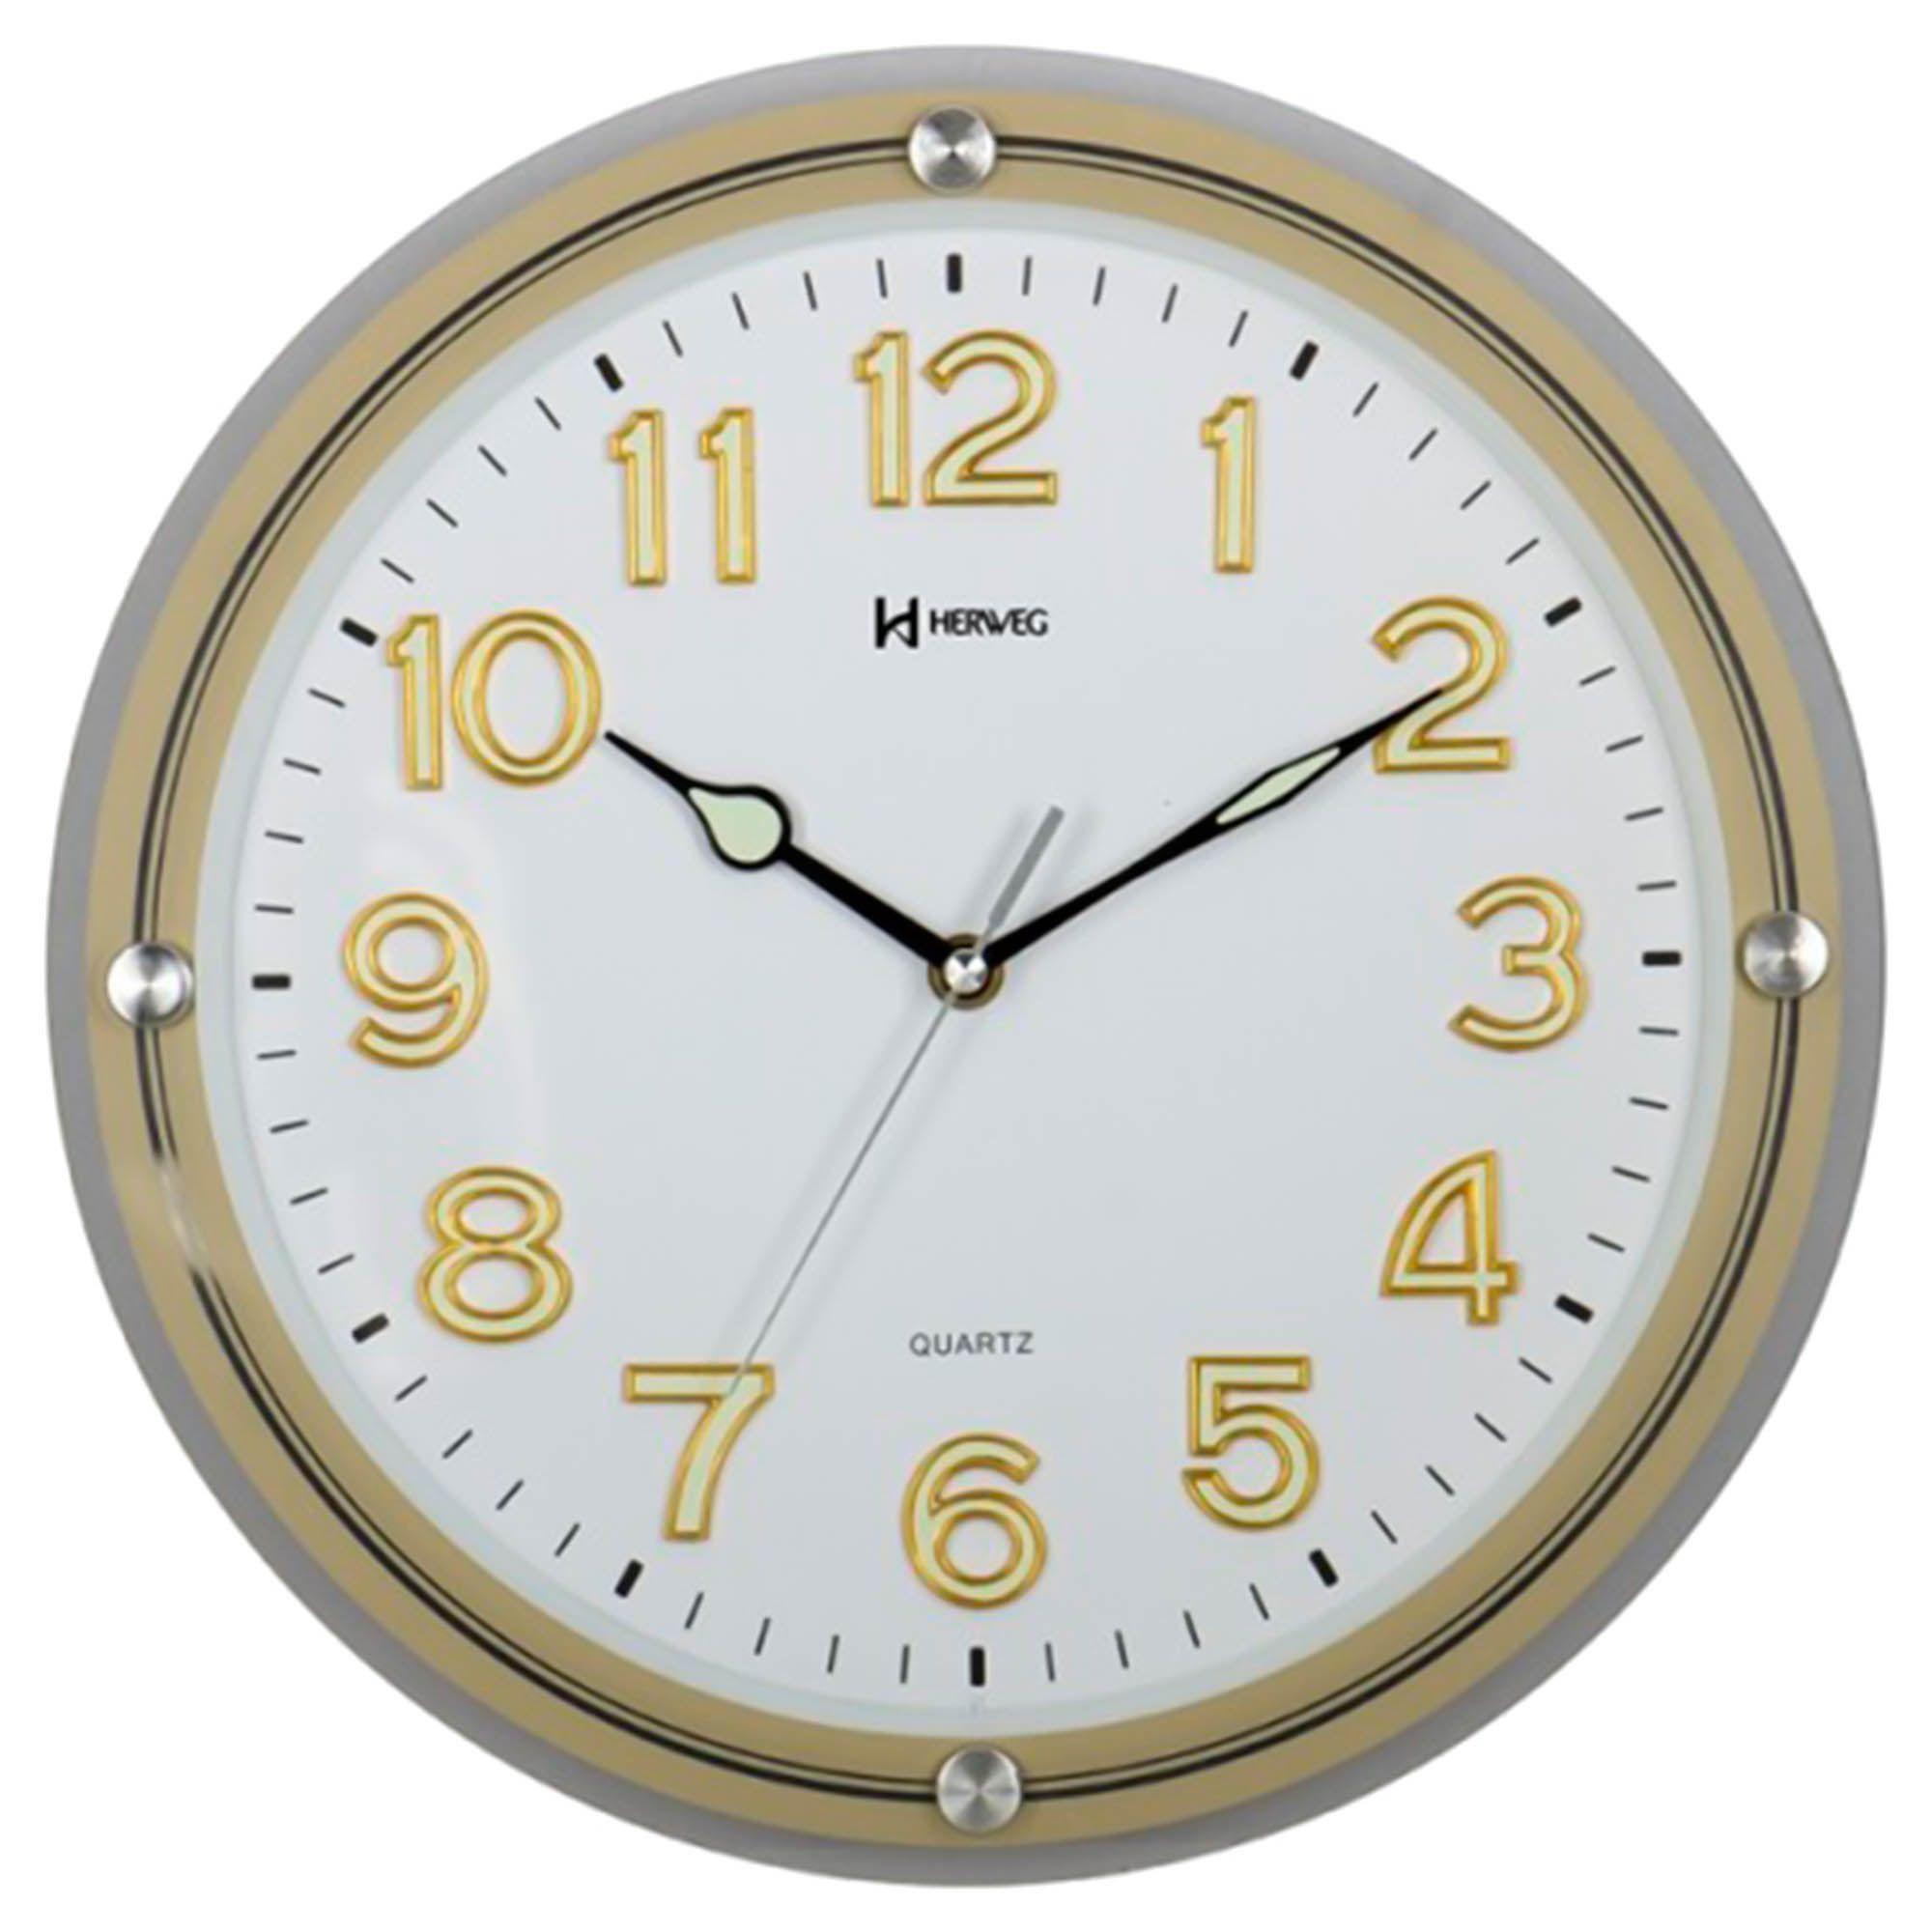 Relógio de Parede Analógico Herweg 6461 067 Champanhe Claro Metálico